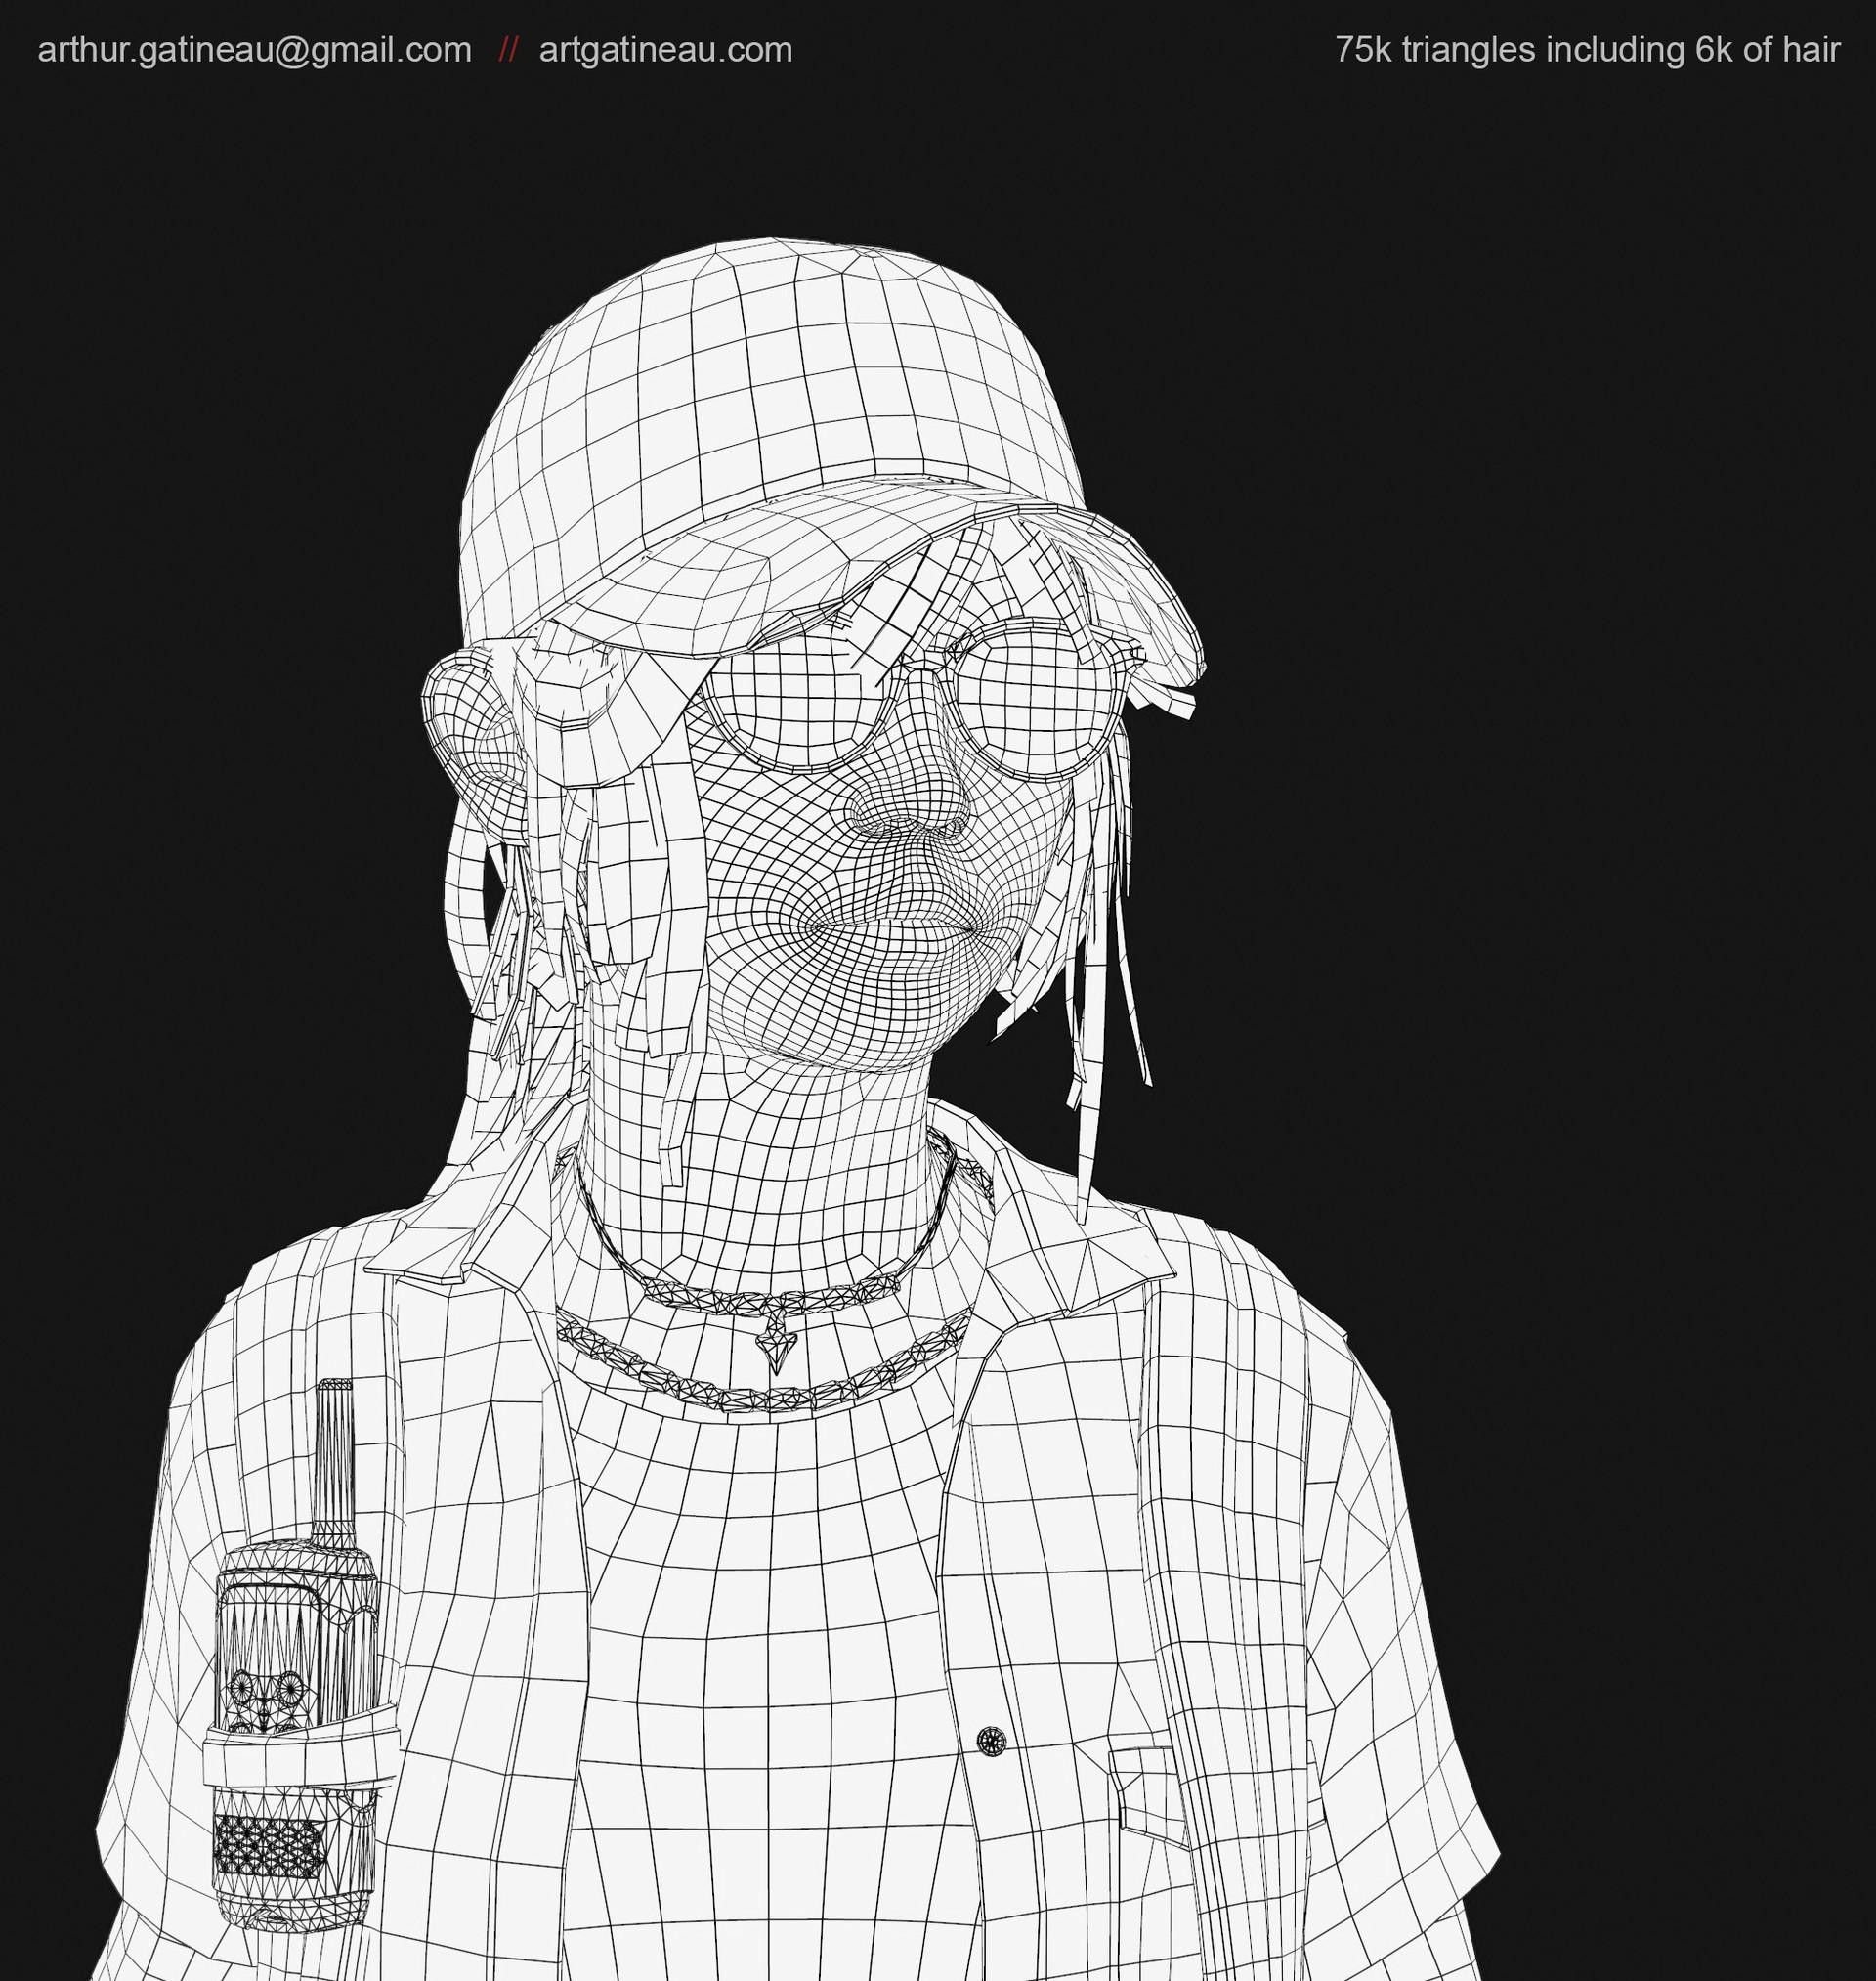 Arthur gatineau marmoset presentation wireface